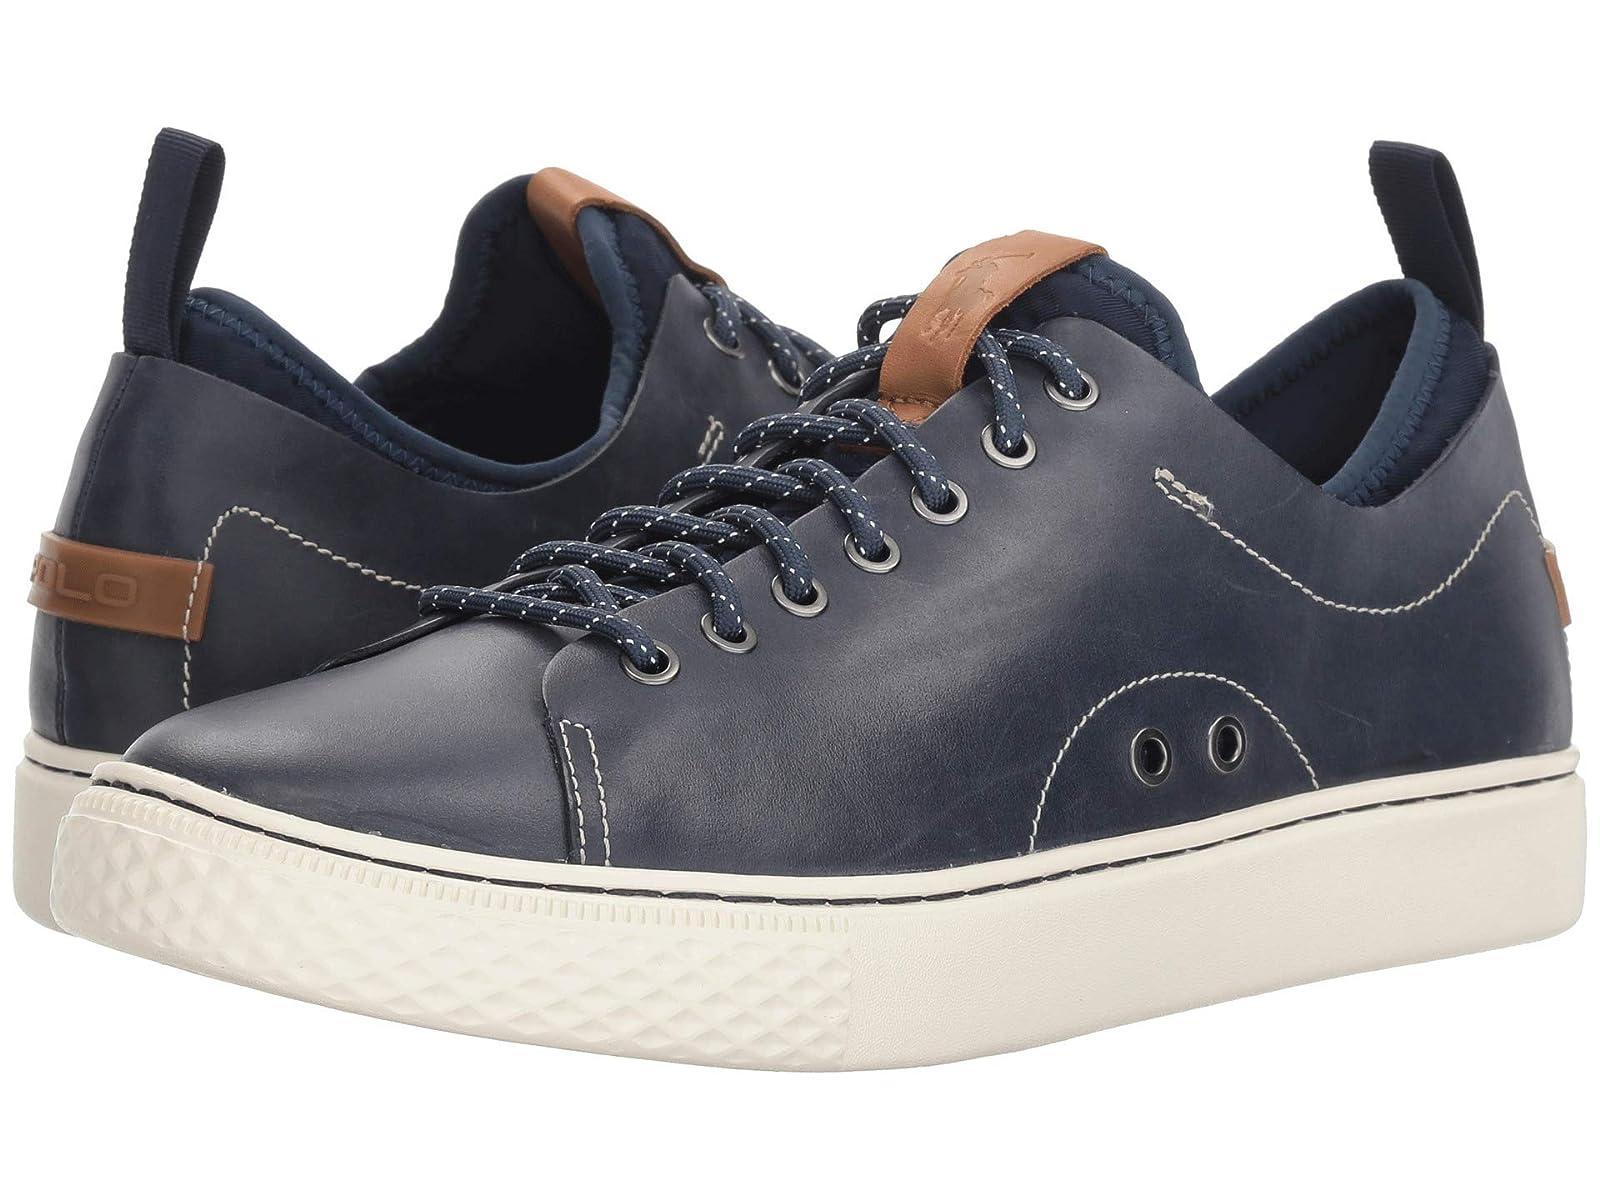 Polo Ralph Lauren DunovinAtmospheric grades have affordable shoes